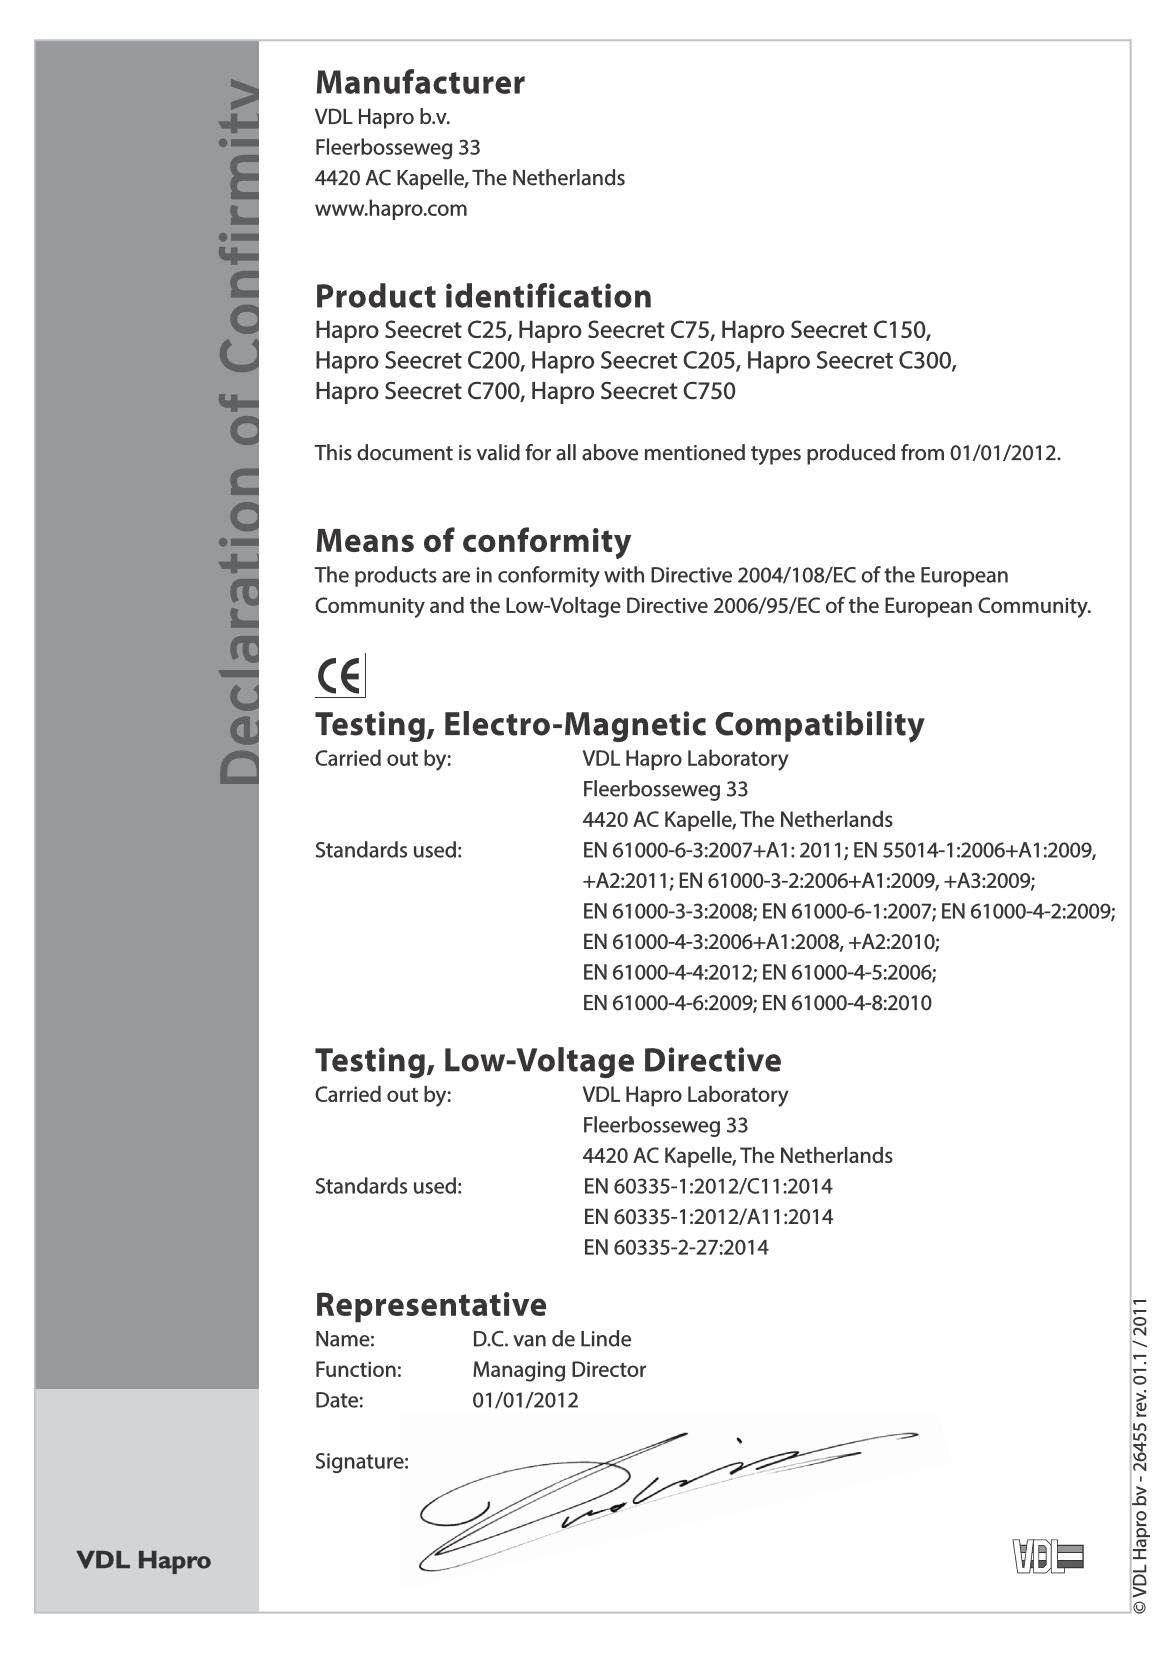 26455-vdl-03-r01-declaration-of-conformity-seecret-page-1.jpeg